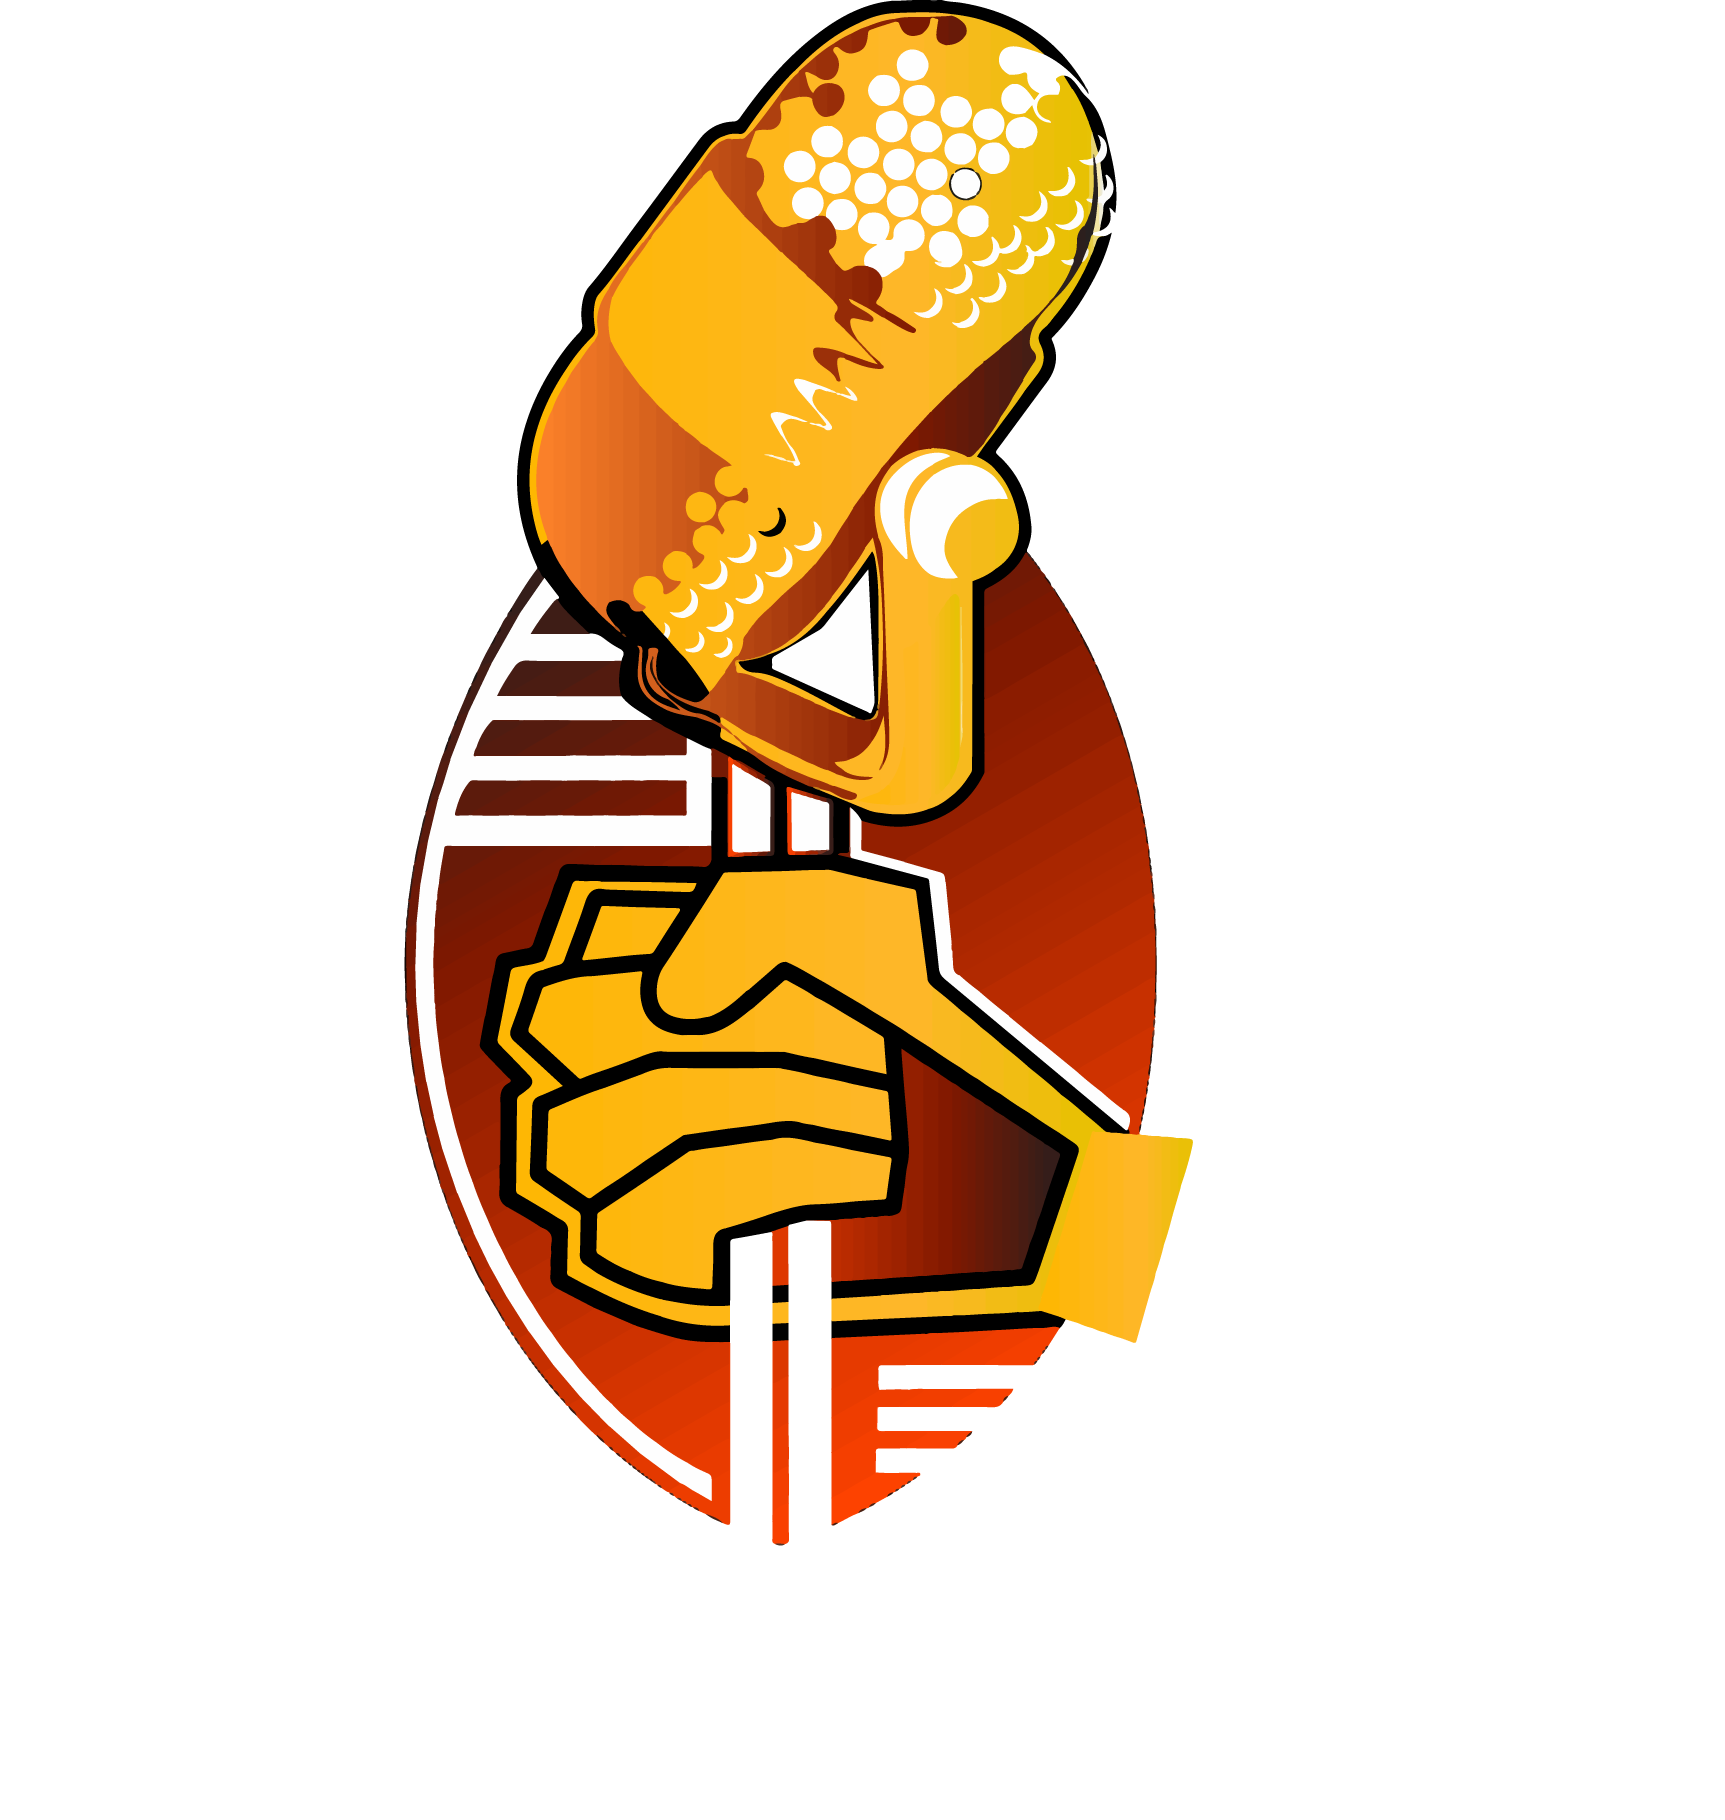 Emrabulweni